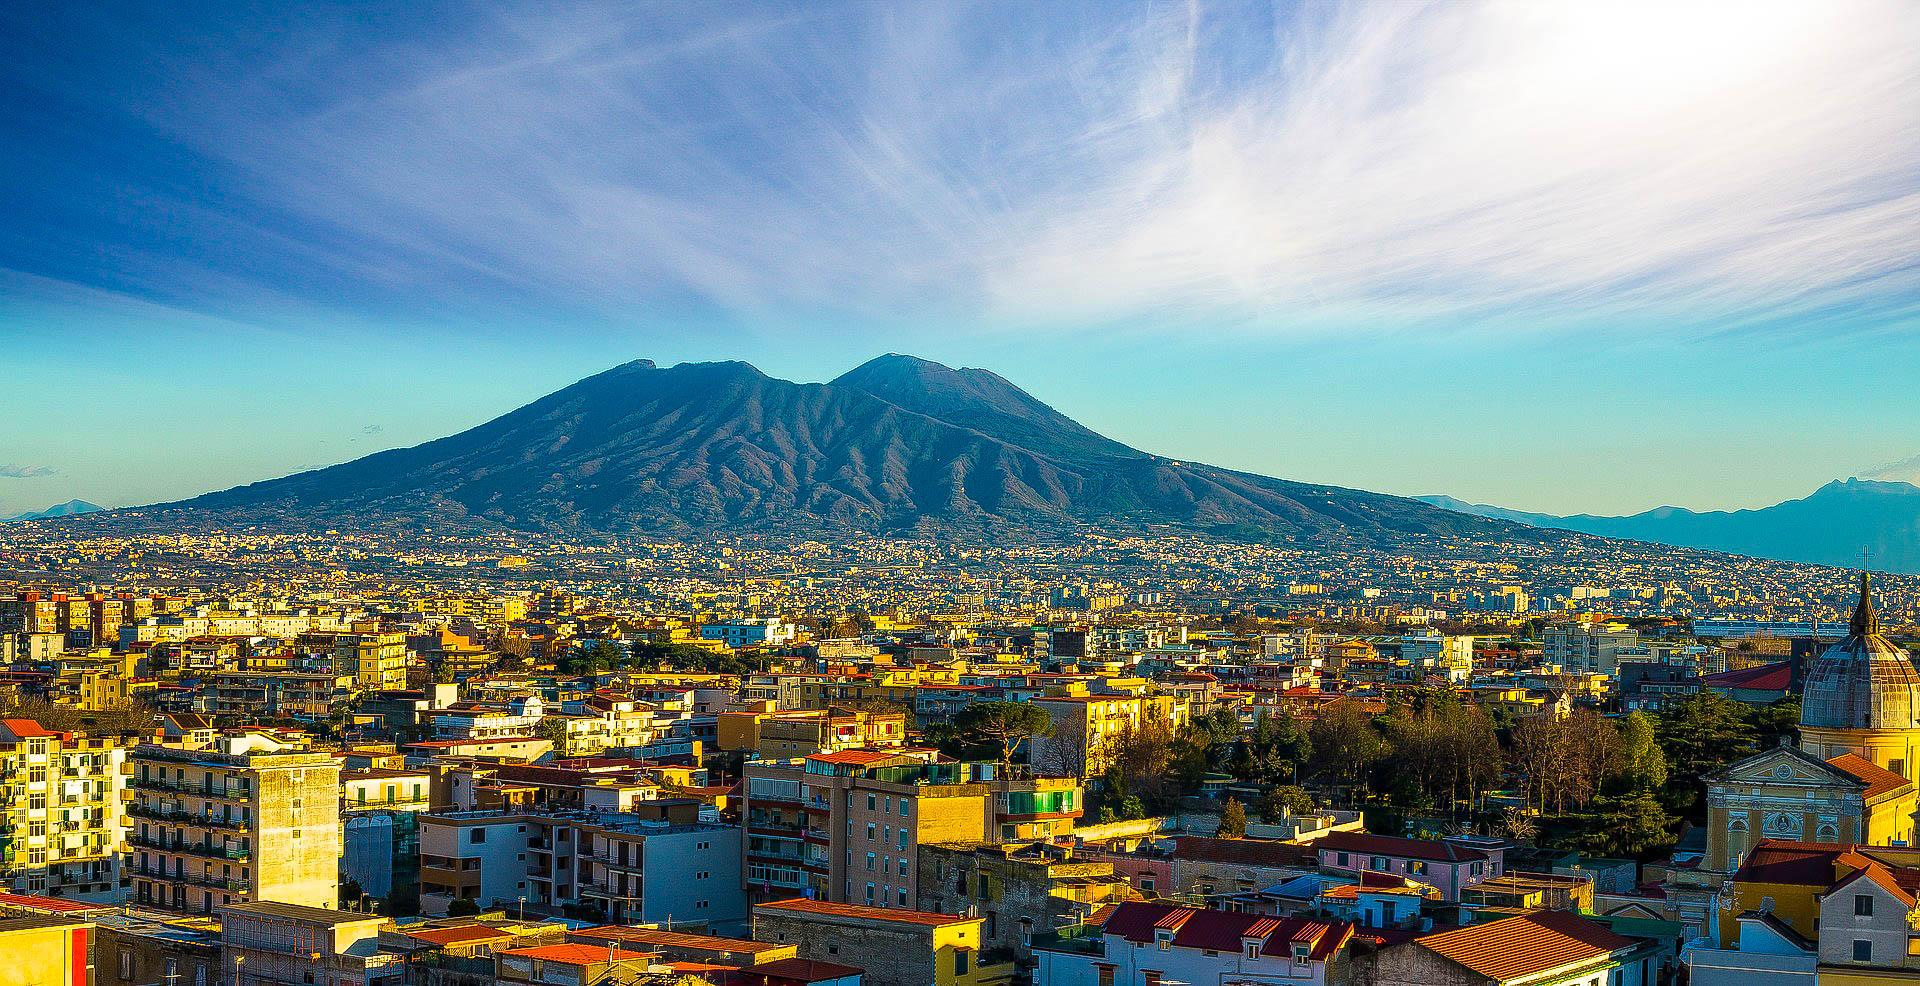 Італія Неаполь Везувій